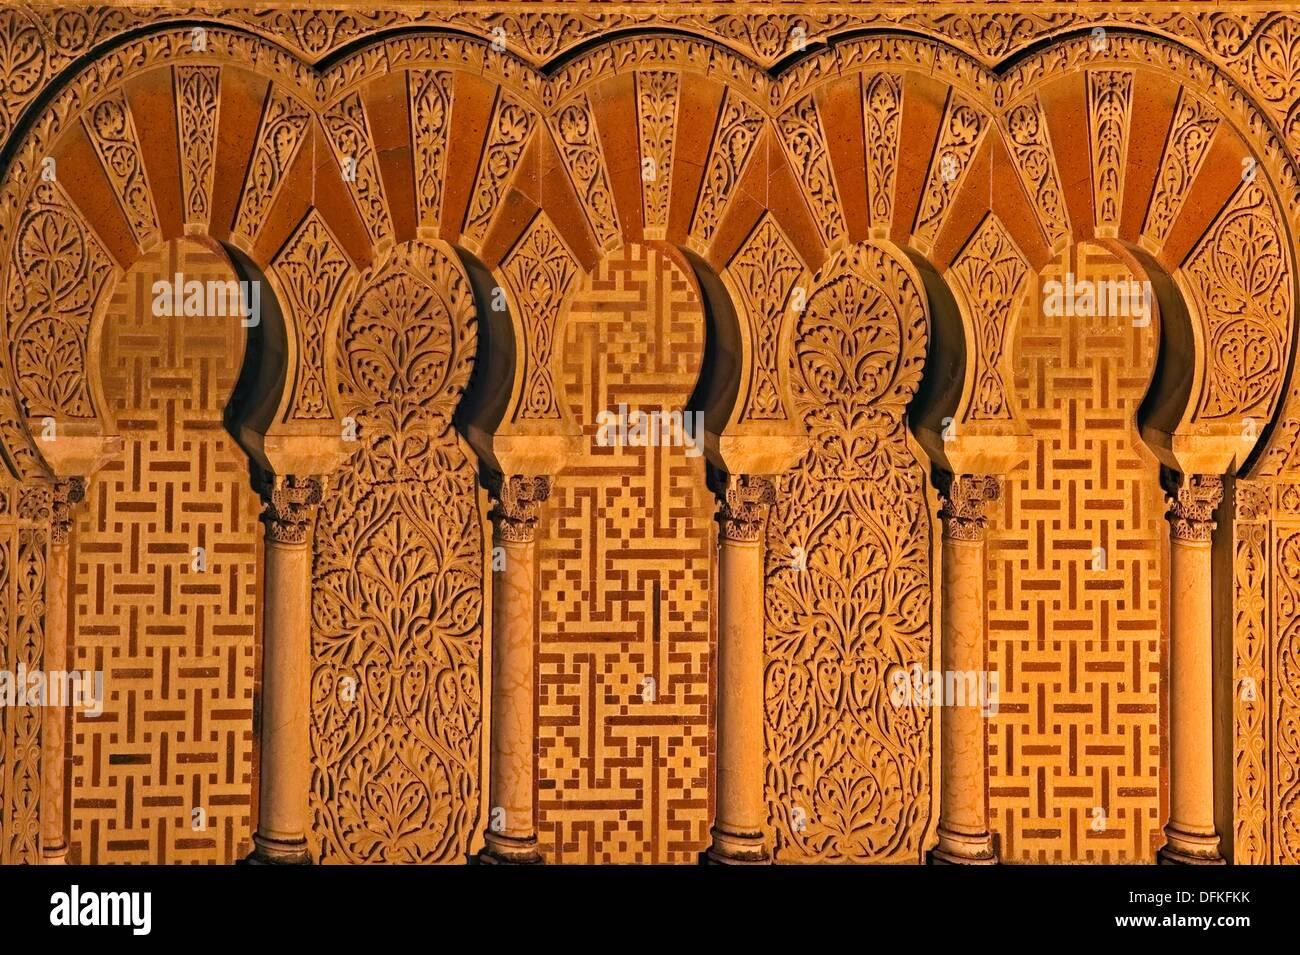 Arab arches, Doorway, Mezquita, Cordoba, Andalucia, Spain Stock Photo